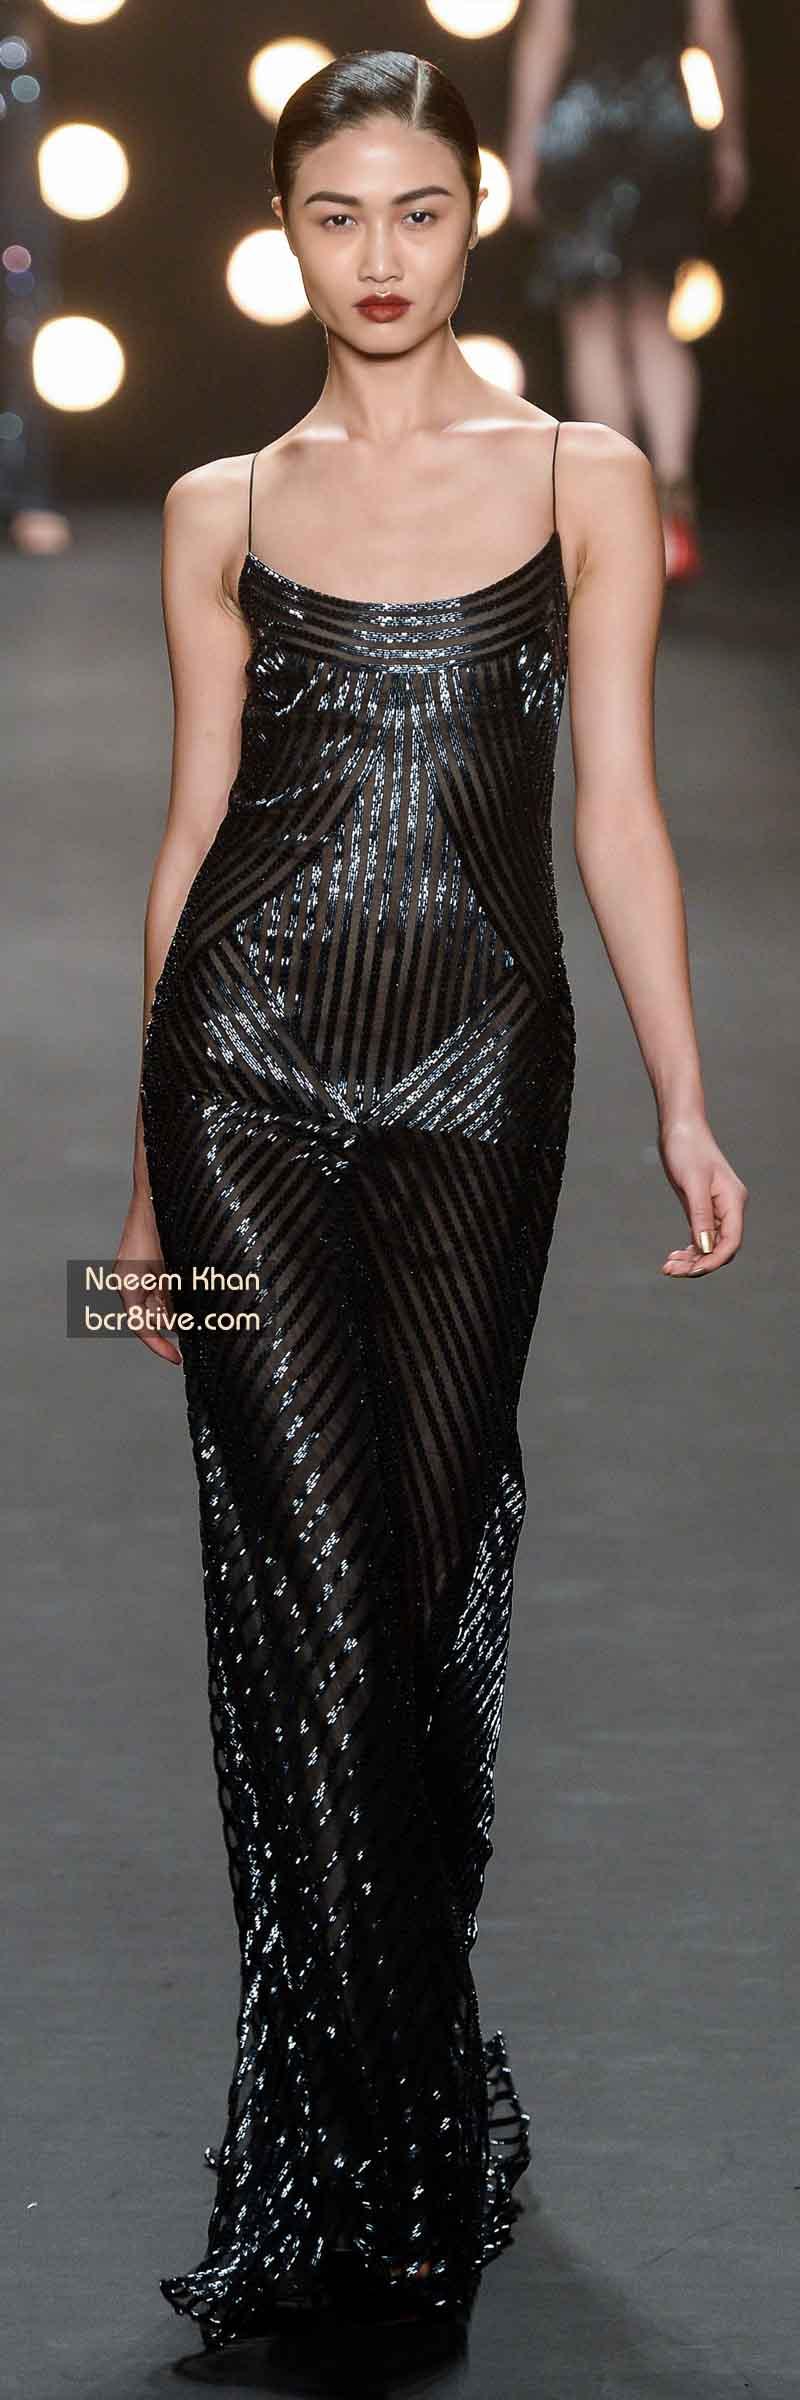 Naeem Khan FW 2014 #NYFW